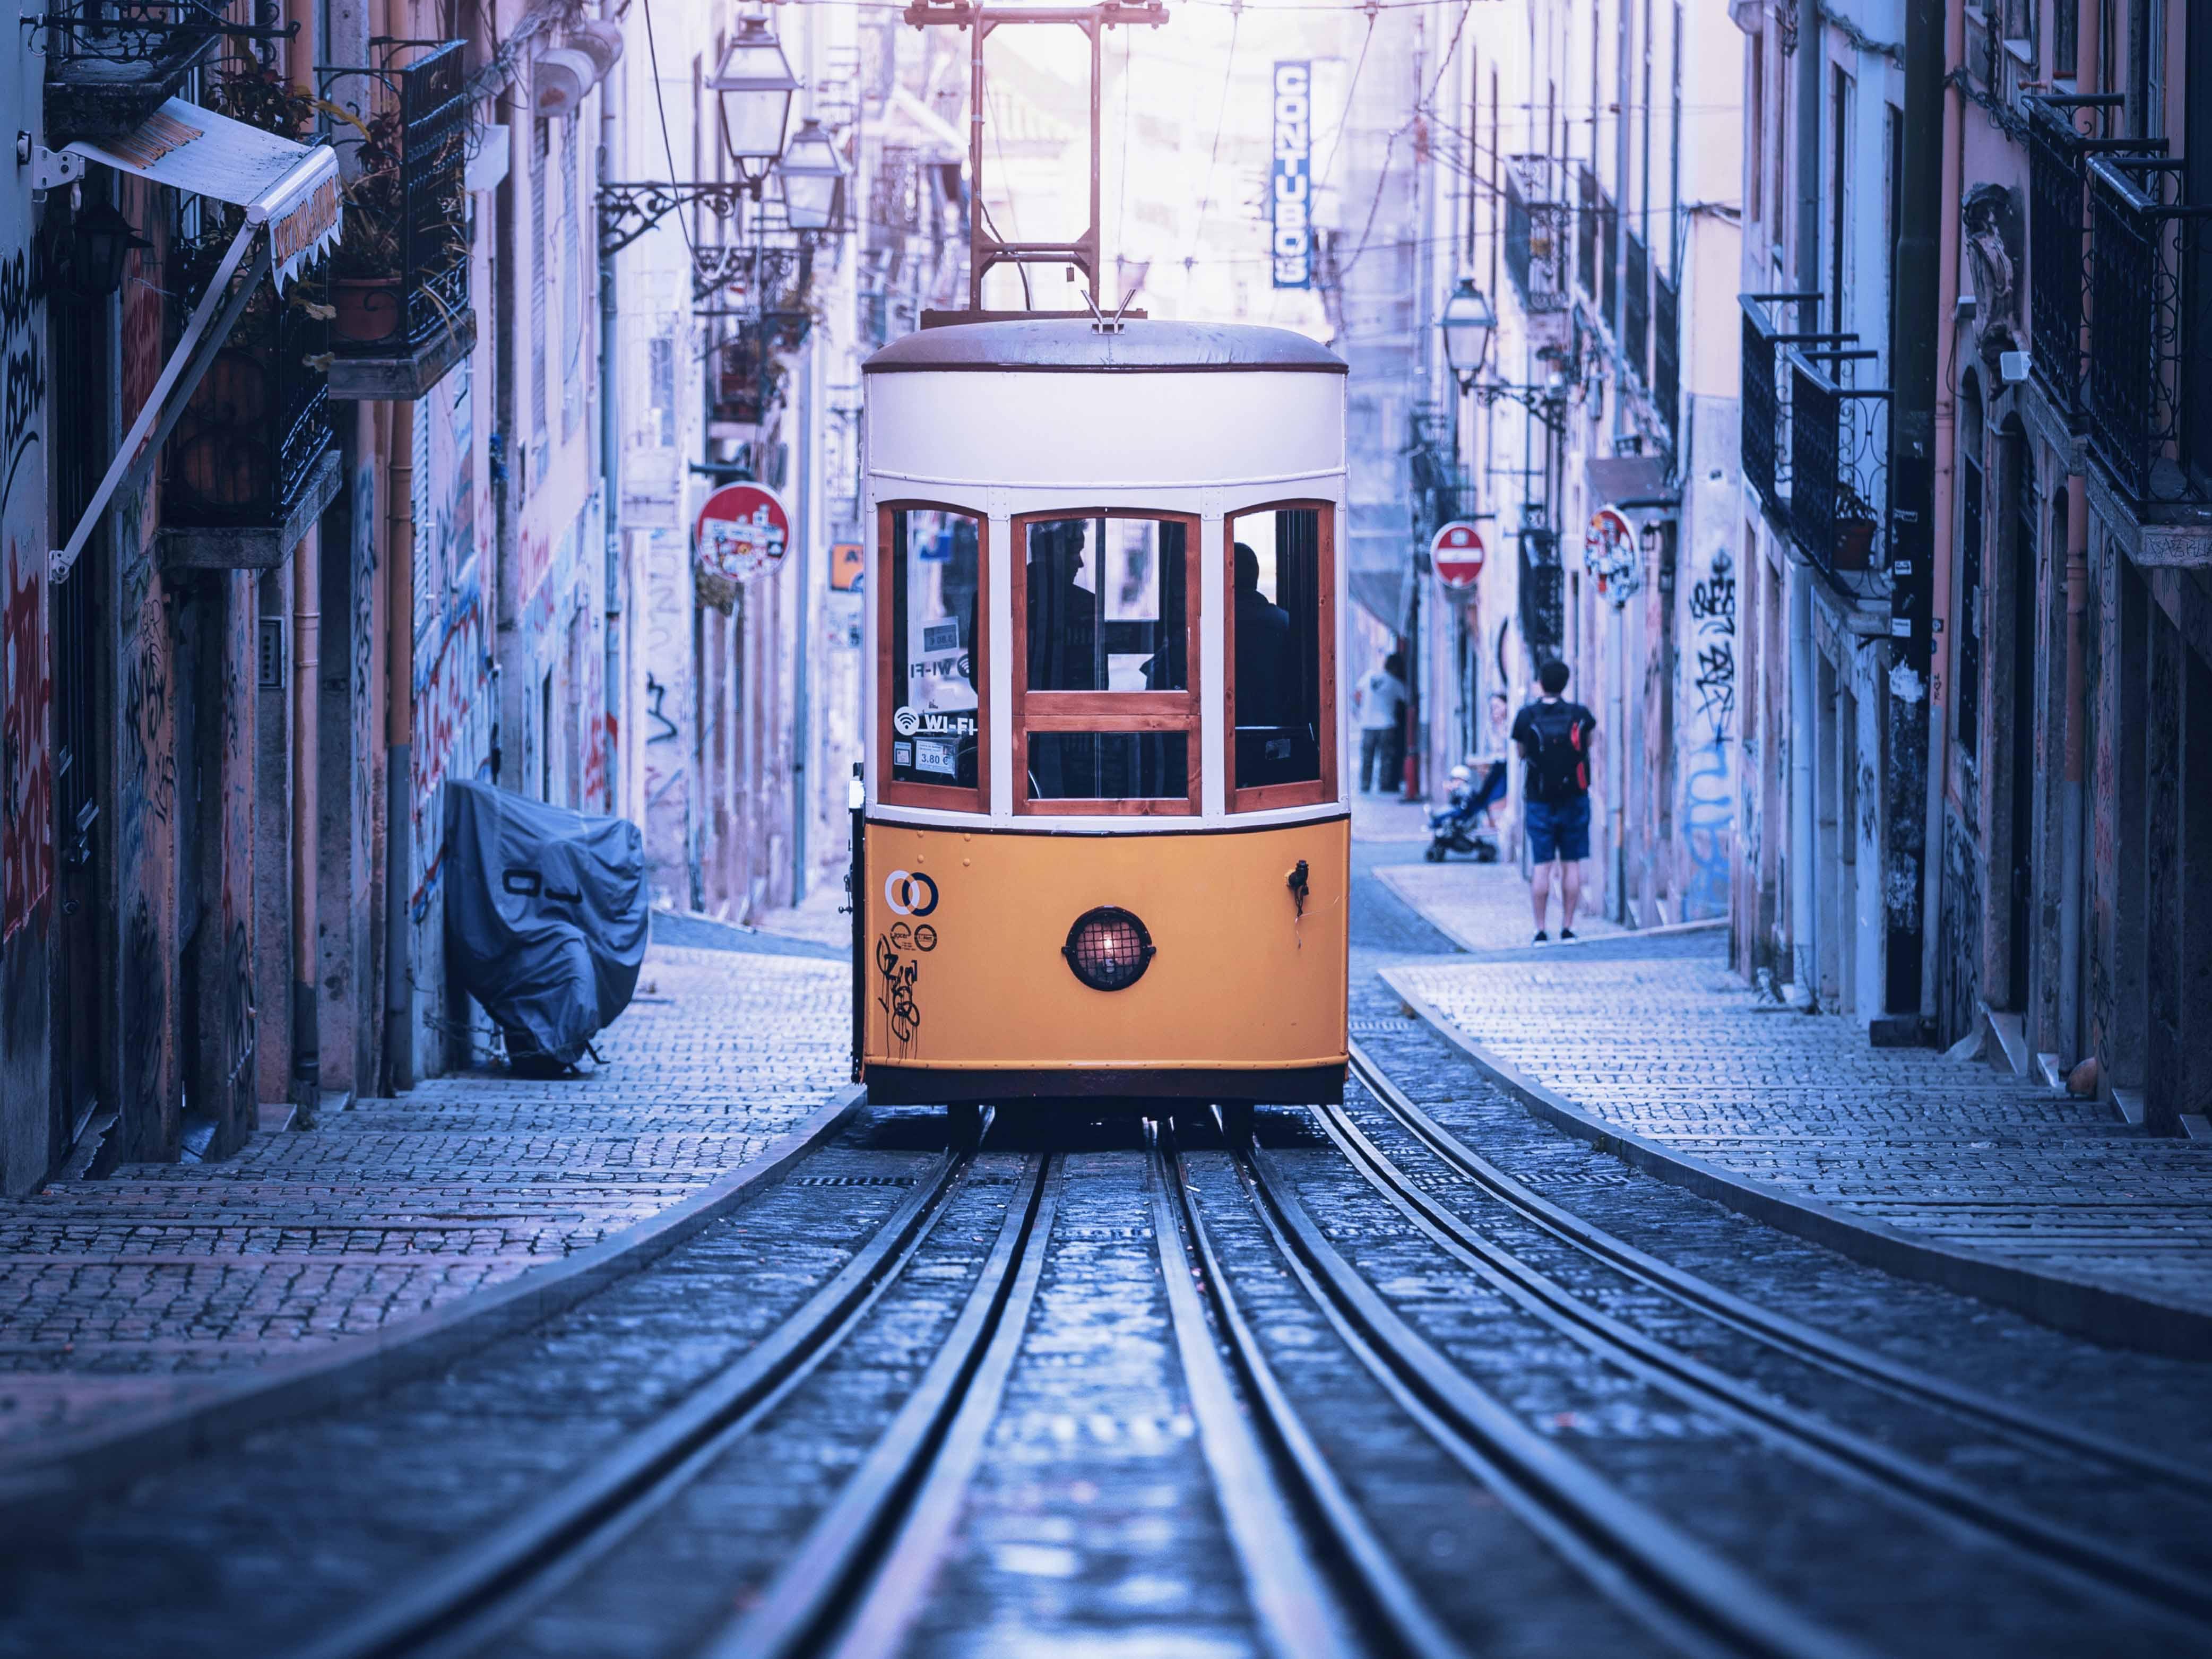 The Key Talent integra a Mindshift e chega a Portugal, impulsionando a sua estratégia internacional